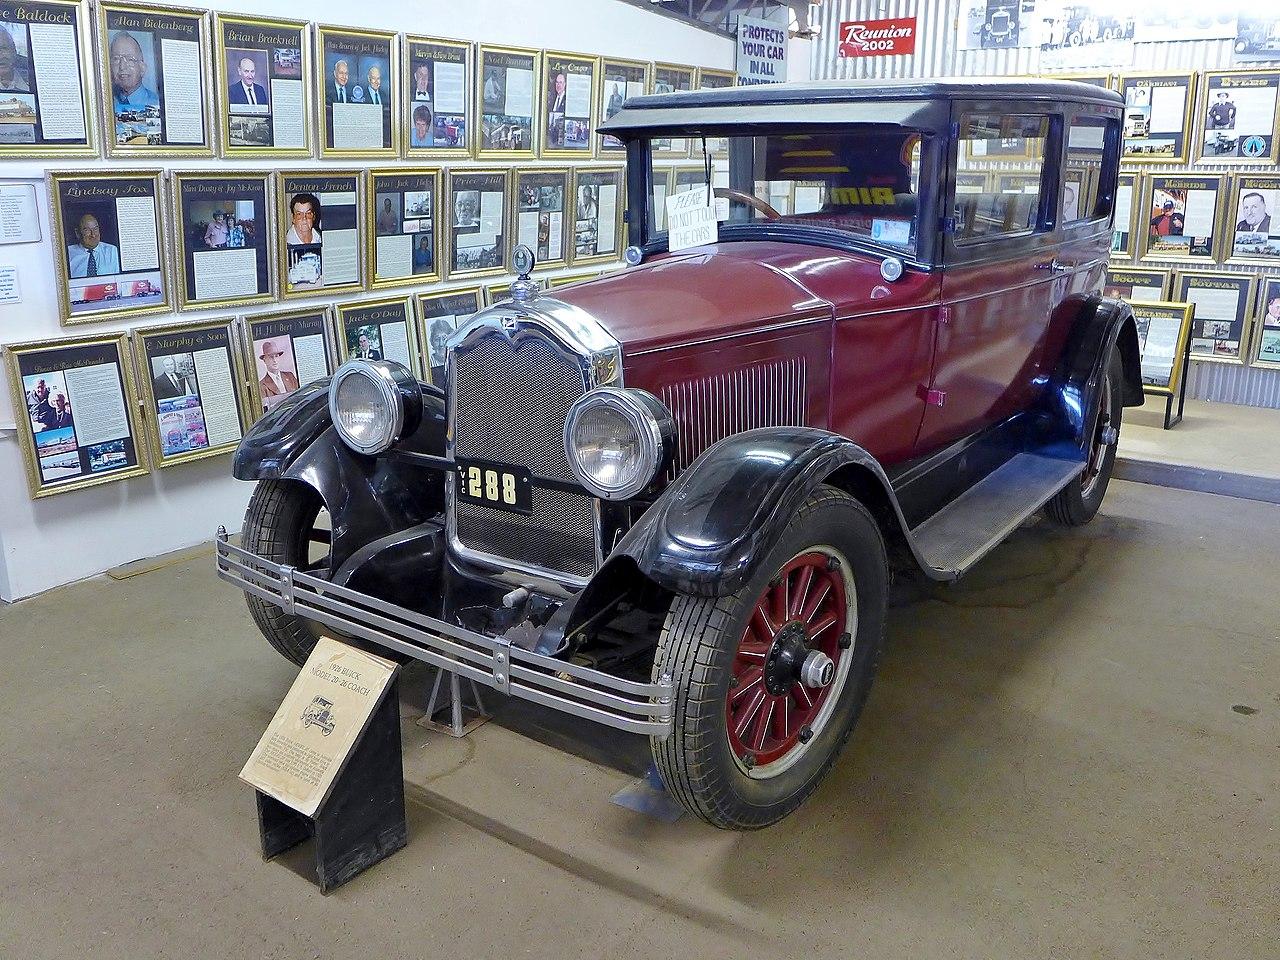 https://upload.wikimedia.org/wikipedia/commons/thumb/9/99/1926_Buick_Model_20-26_Coach%2C_National_Road_Transport_Hall_of_Fame%2C_2015.JPG/1280px-1926_Buick_Model_20-26_Coach%2C_National_Road_Transport_Hall_of_Fame%2C_2015.JPG